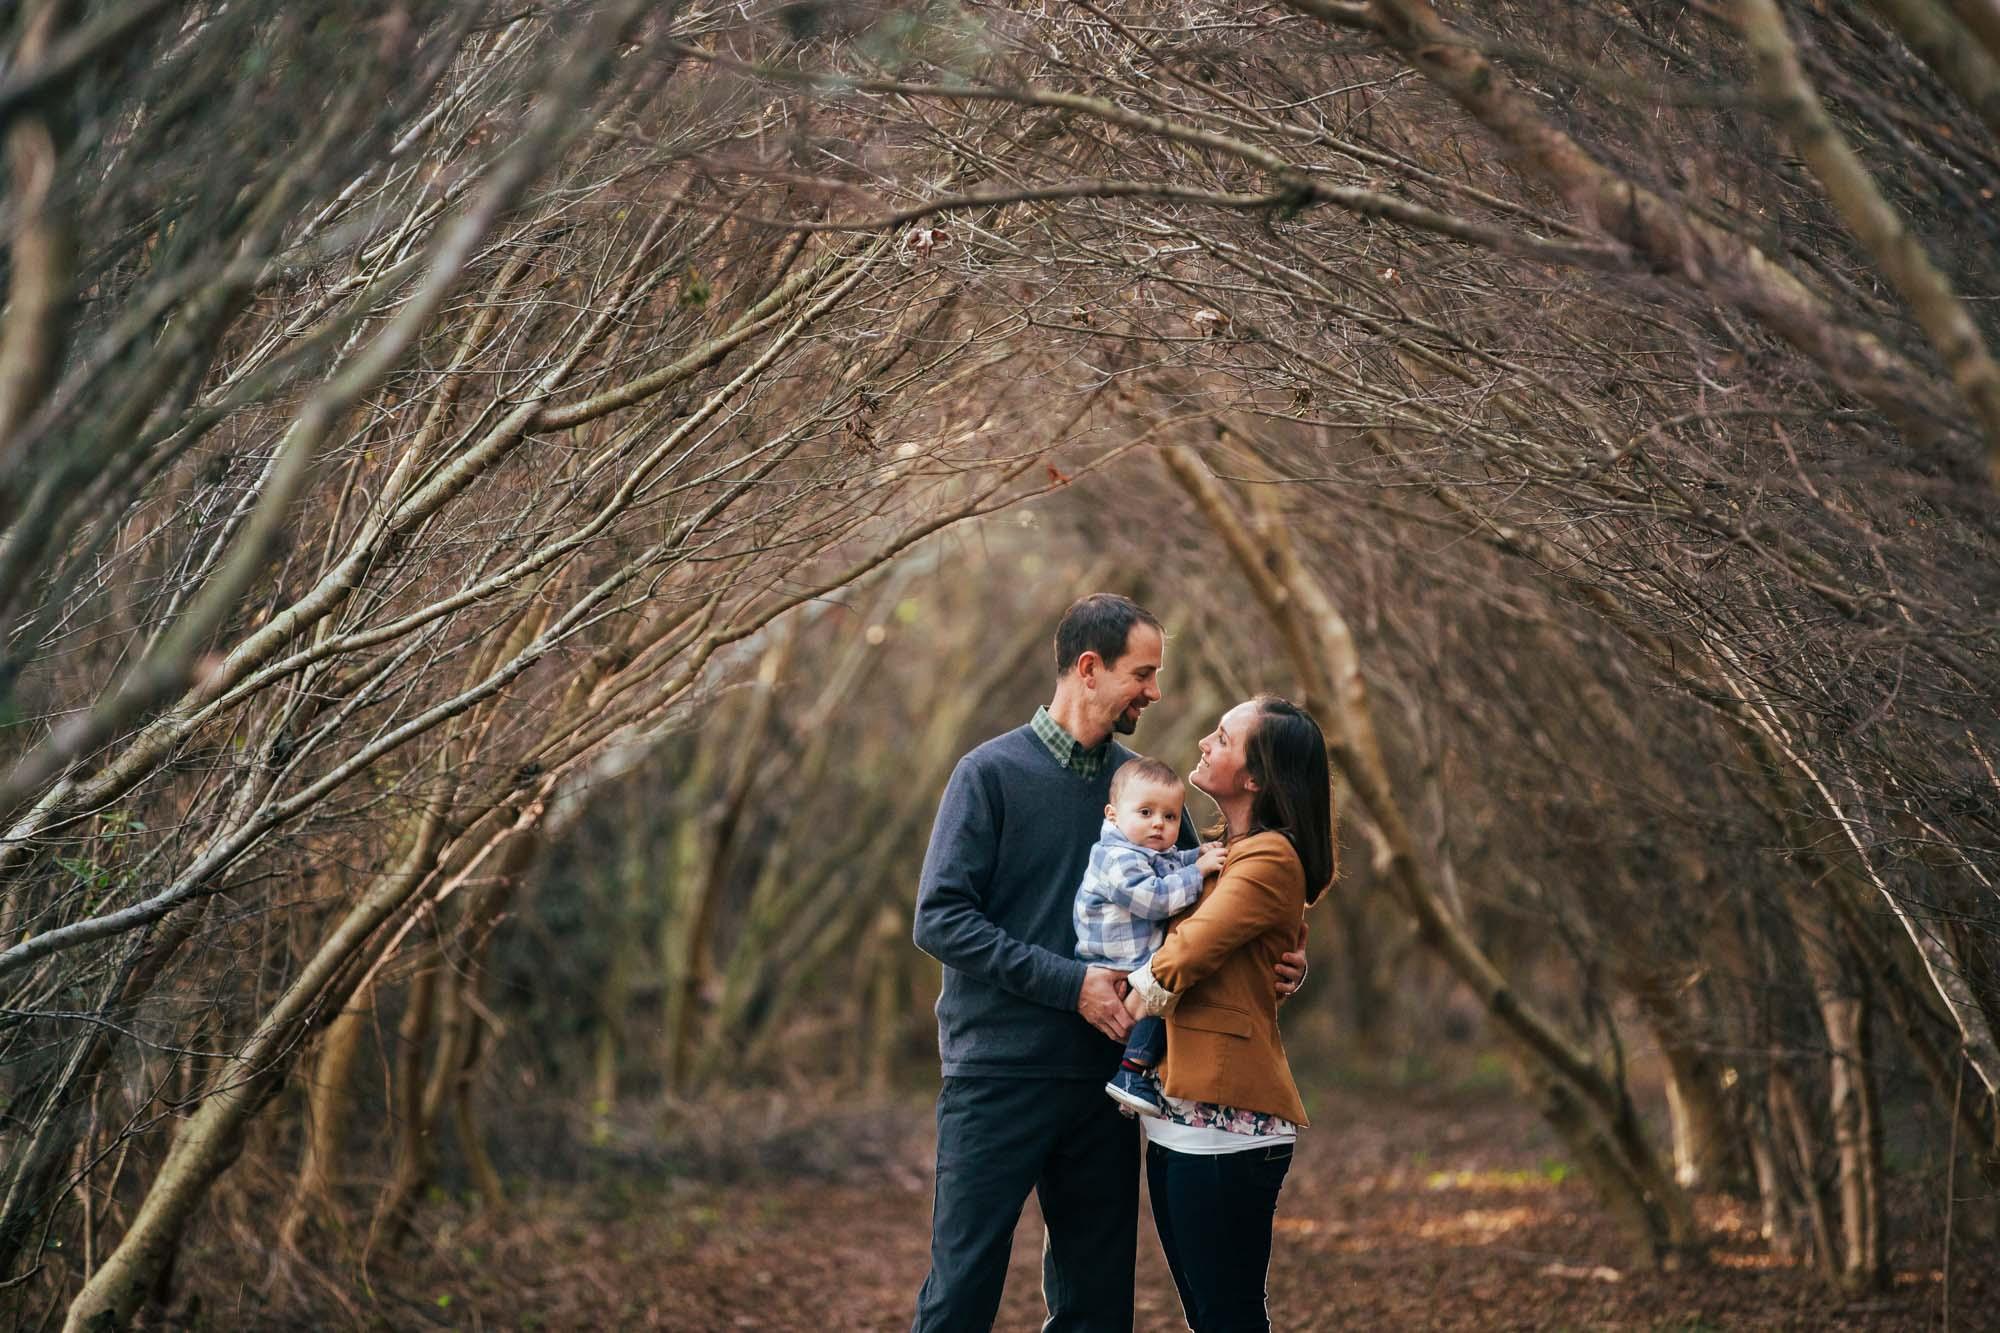 2017.1.1-Family_Portrait-Photography-Ocean-City-Maryland-Rackliffe-House 18.jpg